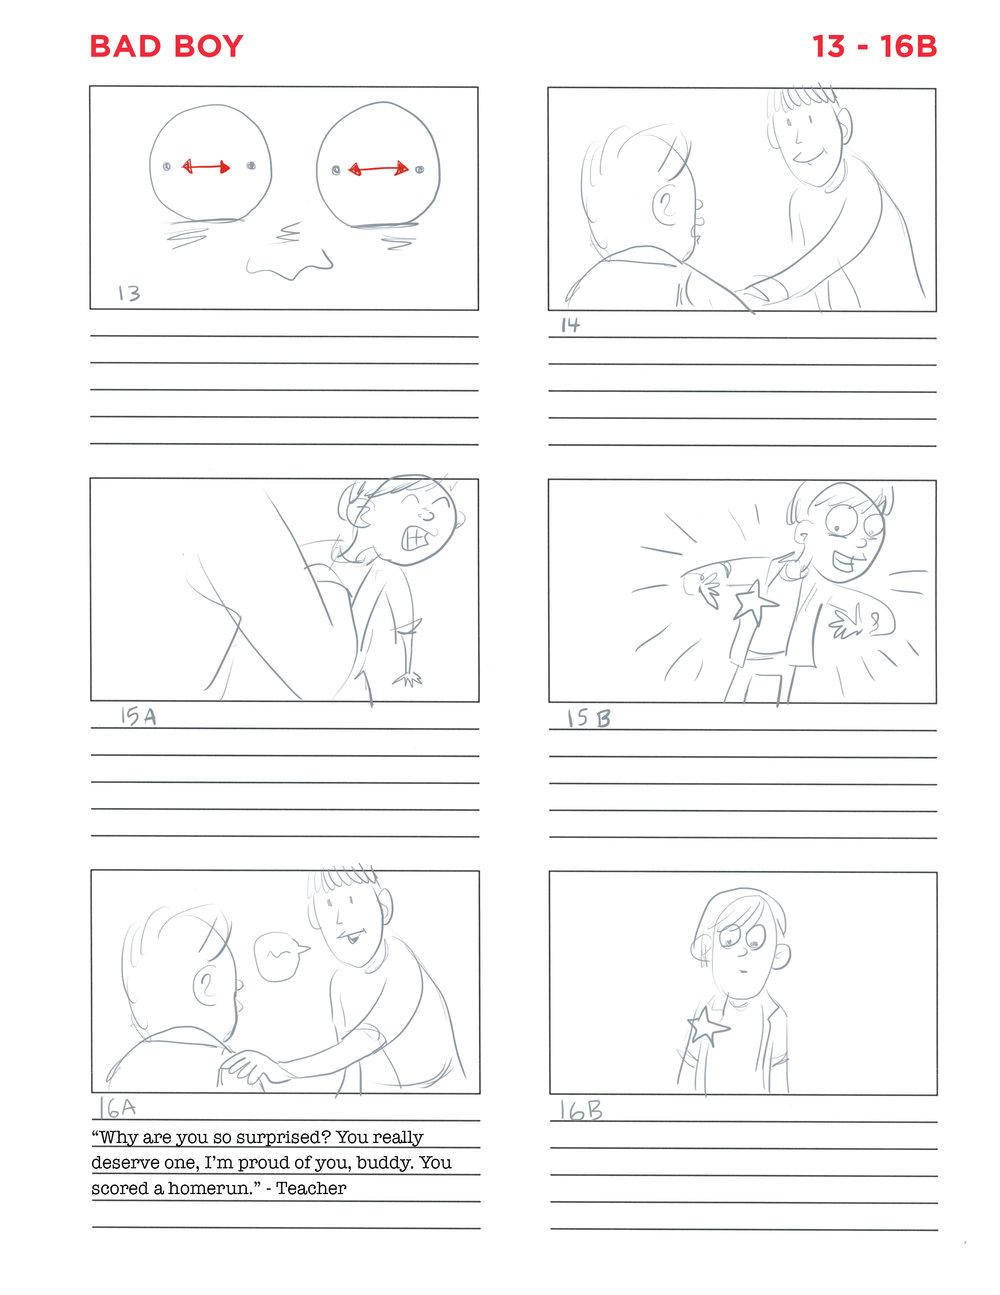 BadBoy-Storyboard-D.jpg